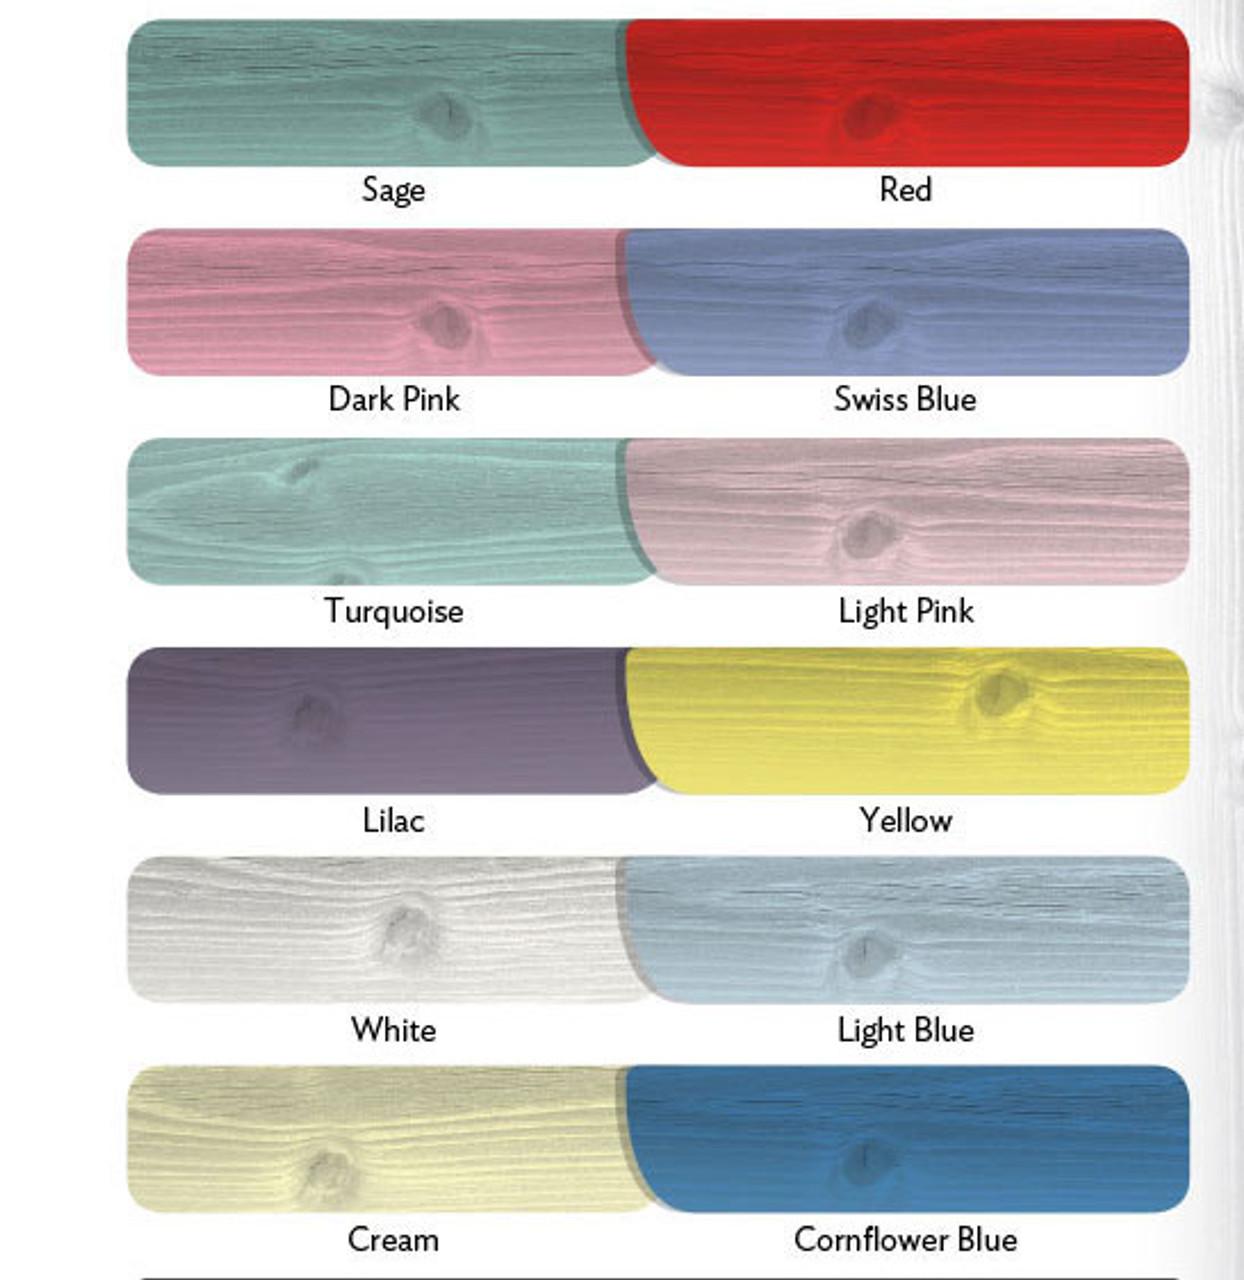 Shedlands Fantasia Playhouse colours